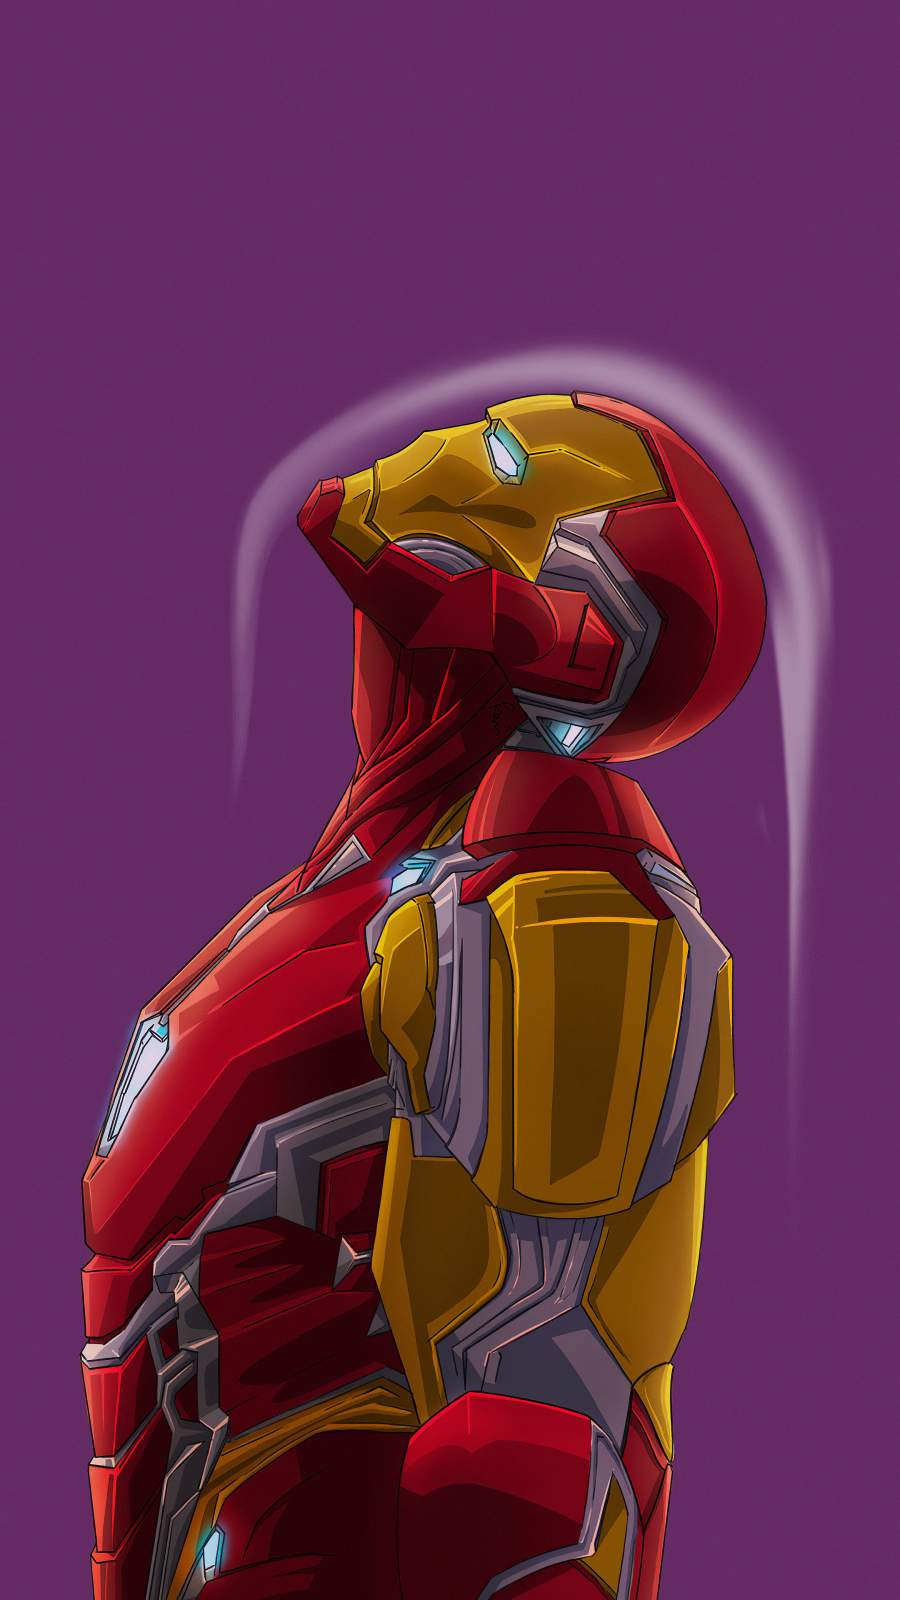 Iron Man Go Up iPhone Wallpaper